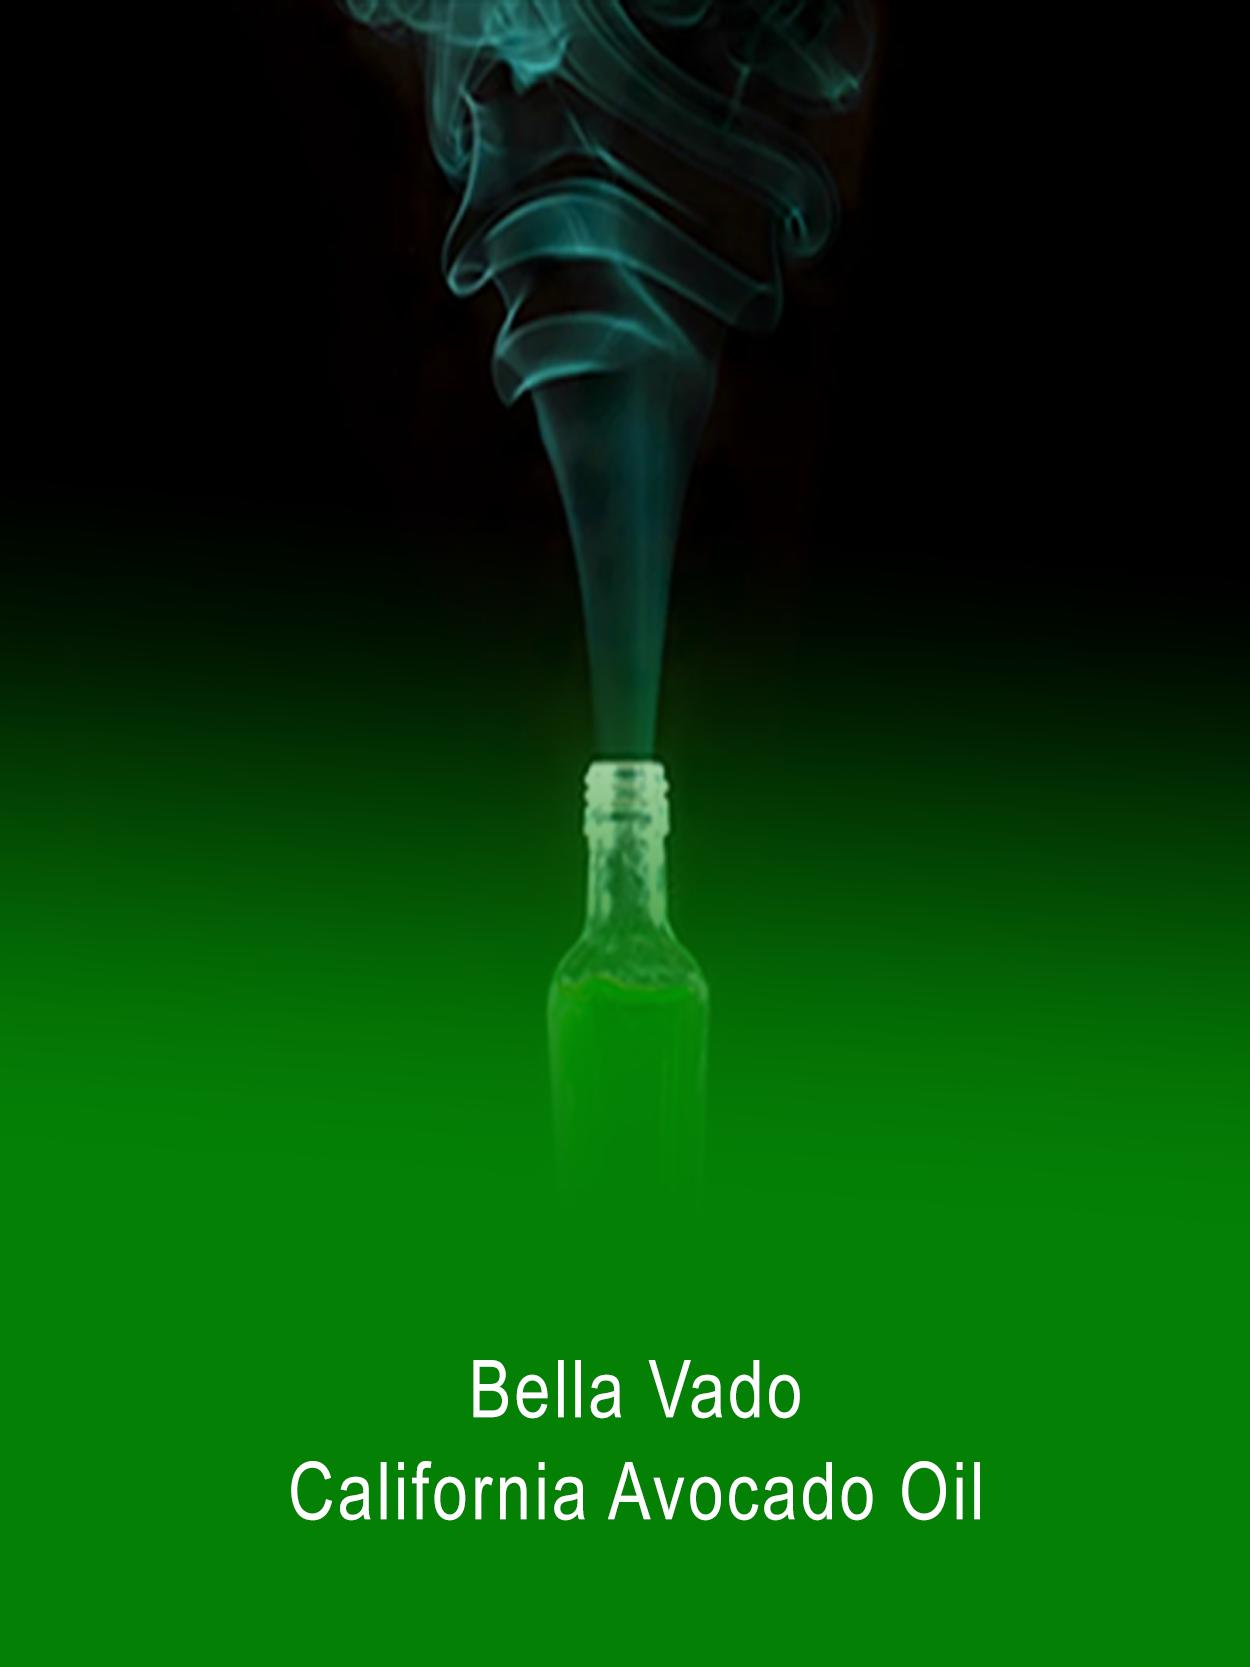 Bella Vado Alexa Skill - California Avocado Oil